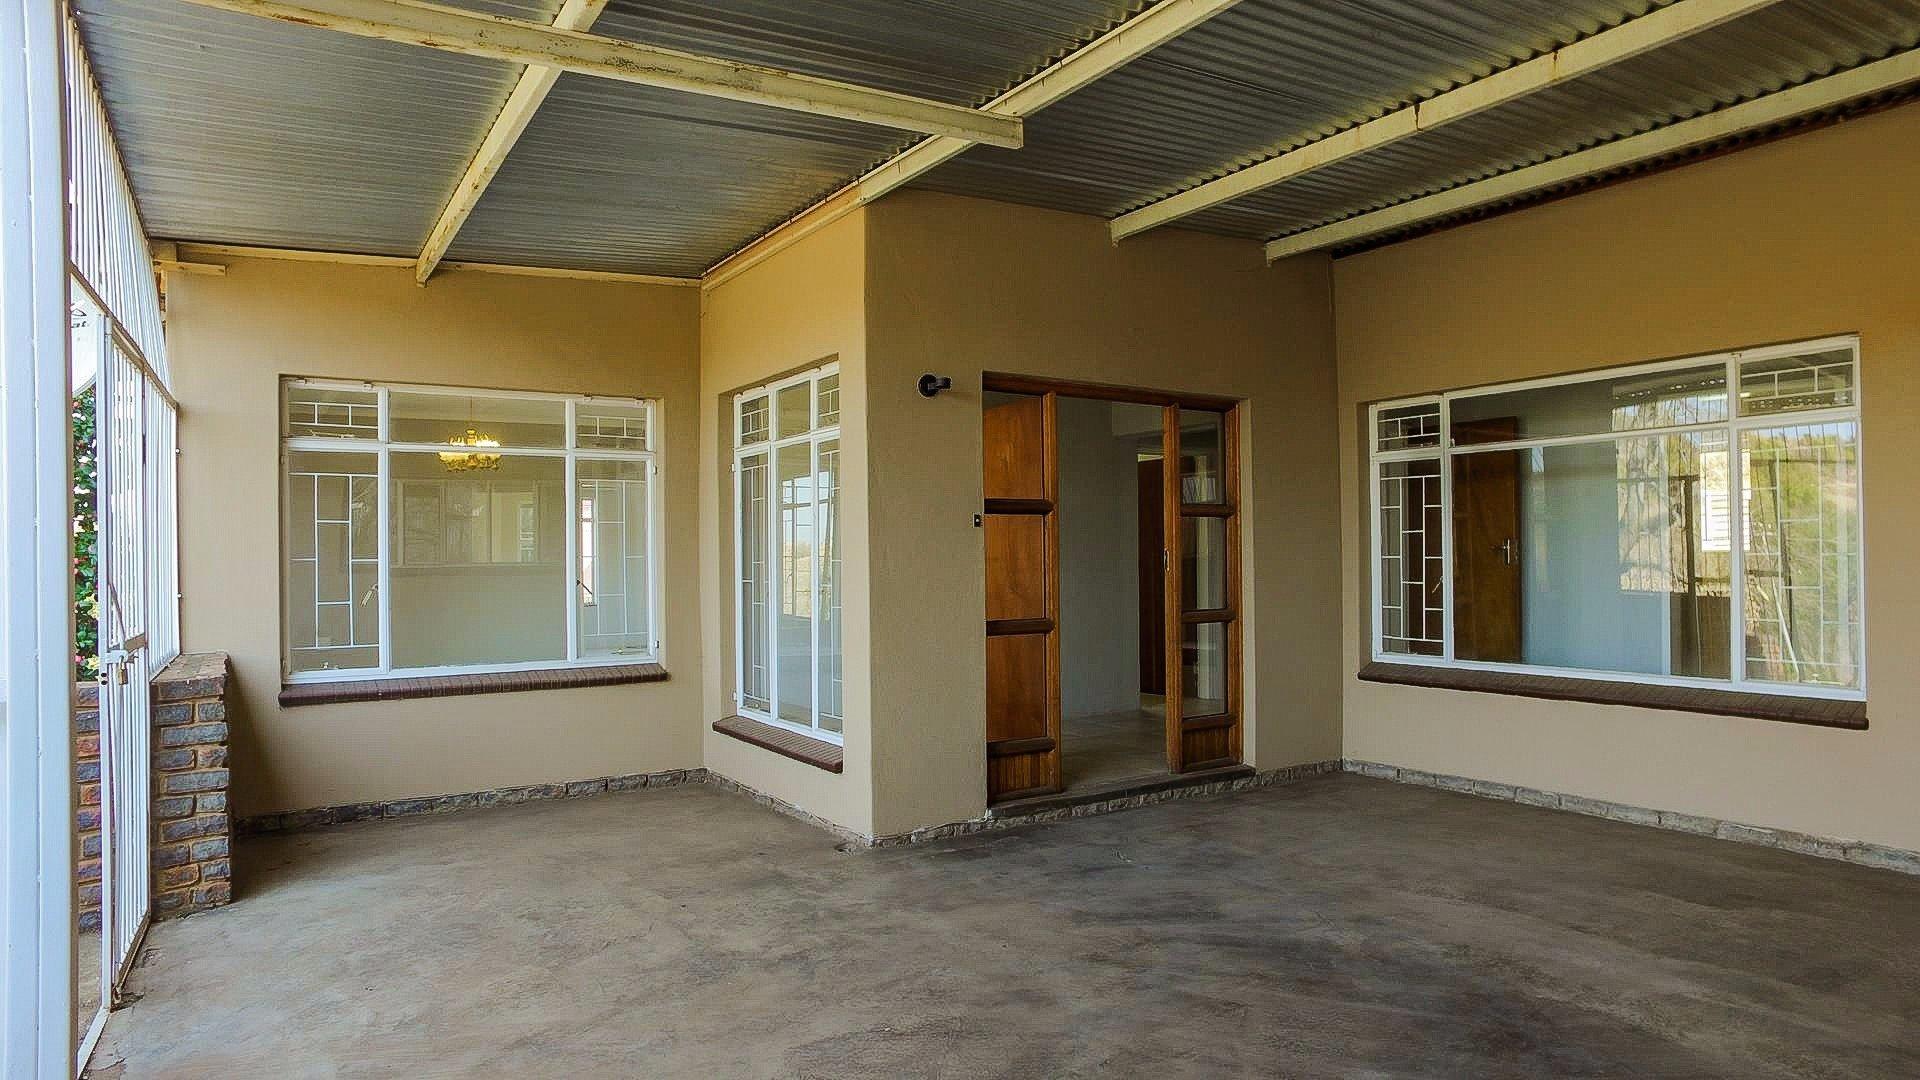 Erasmia property for sale. Ref No: 13379466. Picture no 15